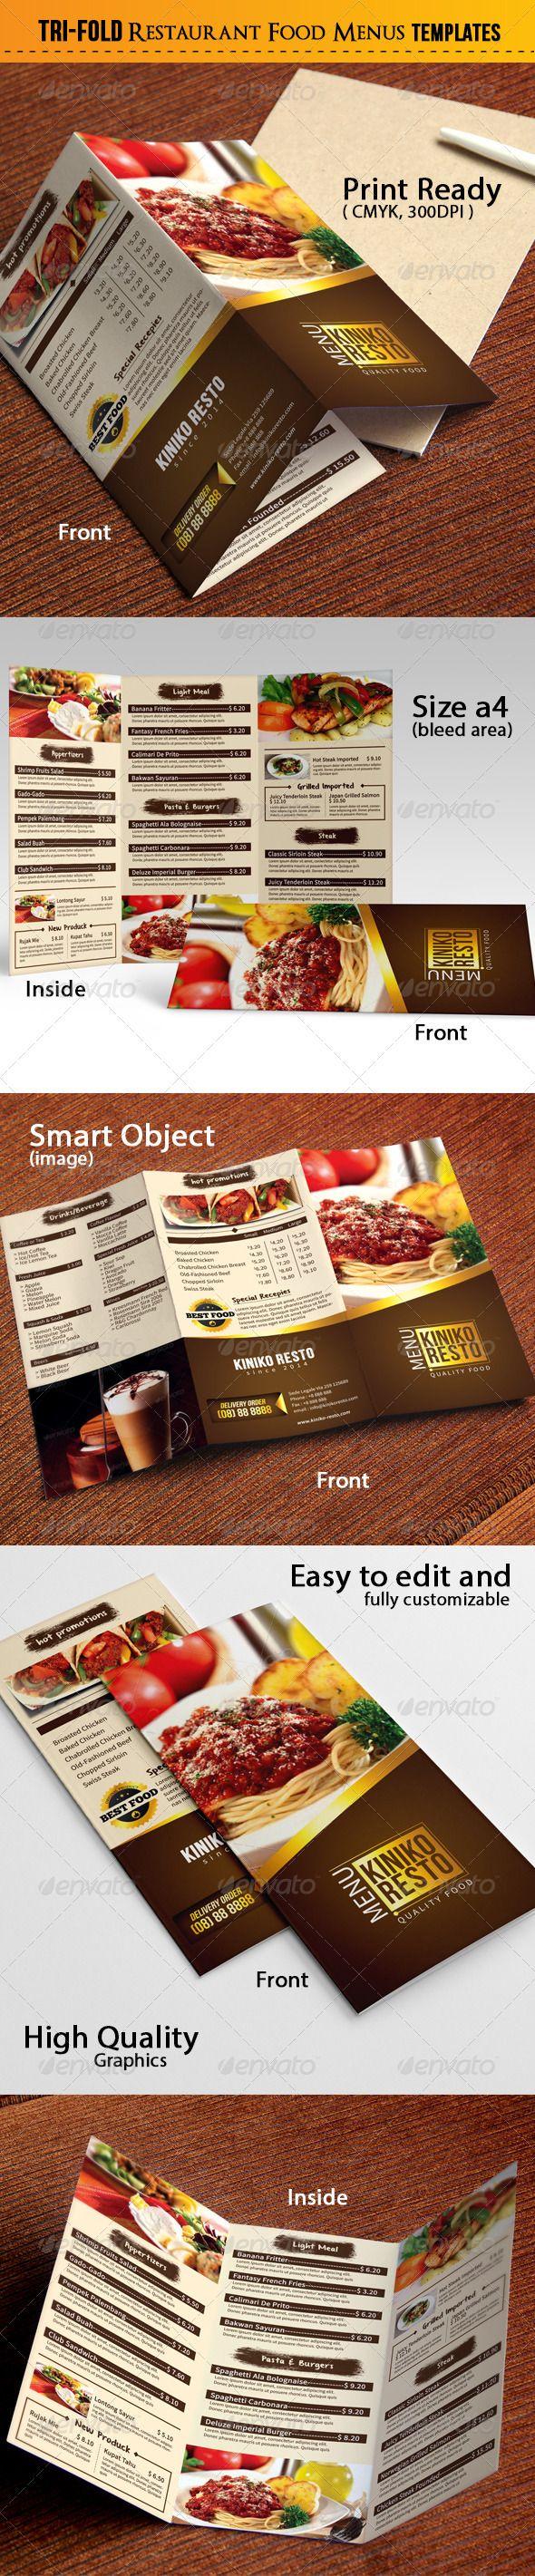 Tri-Fold Food Menu Template #design Download: http://graphicriver.net/item/trifold-food-menu/7345321?ref=ksioks